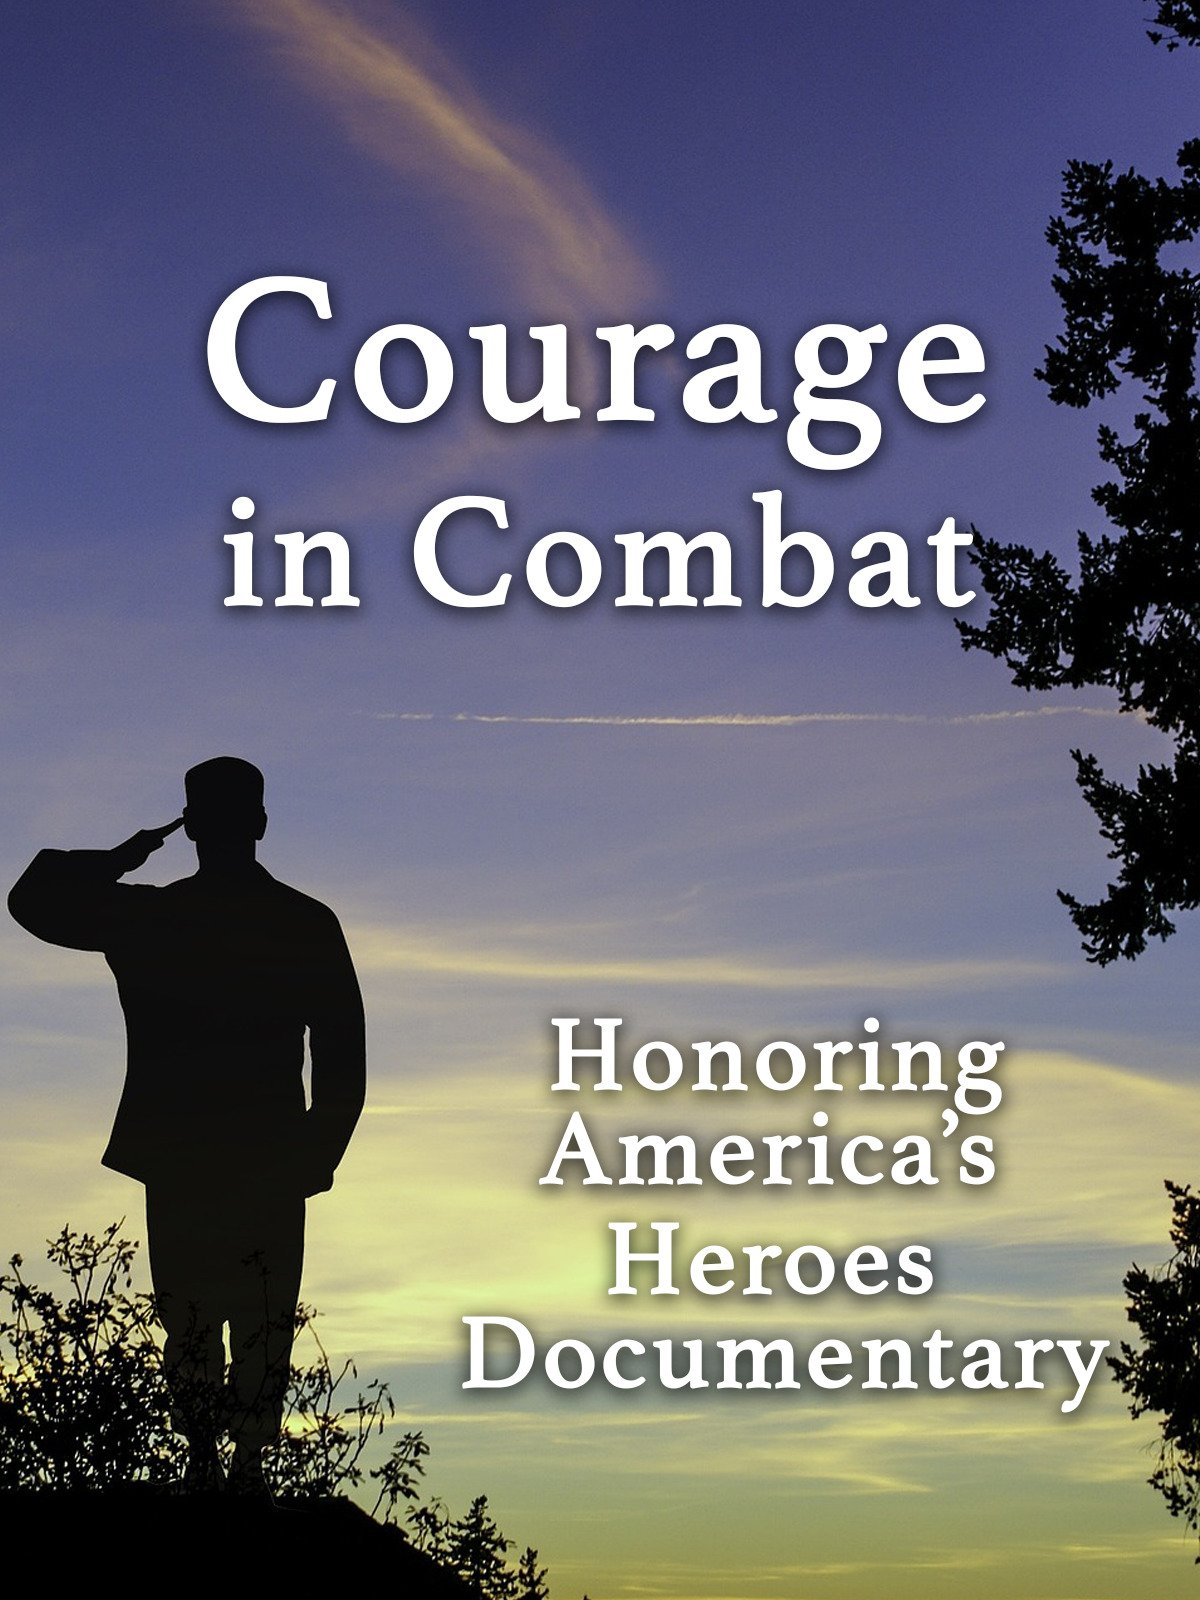 Courage in Combat Honoring America's Heroes Documentary